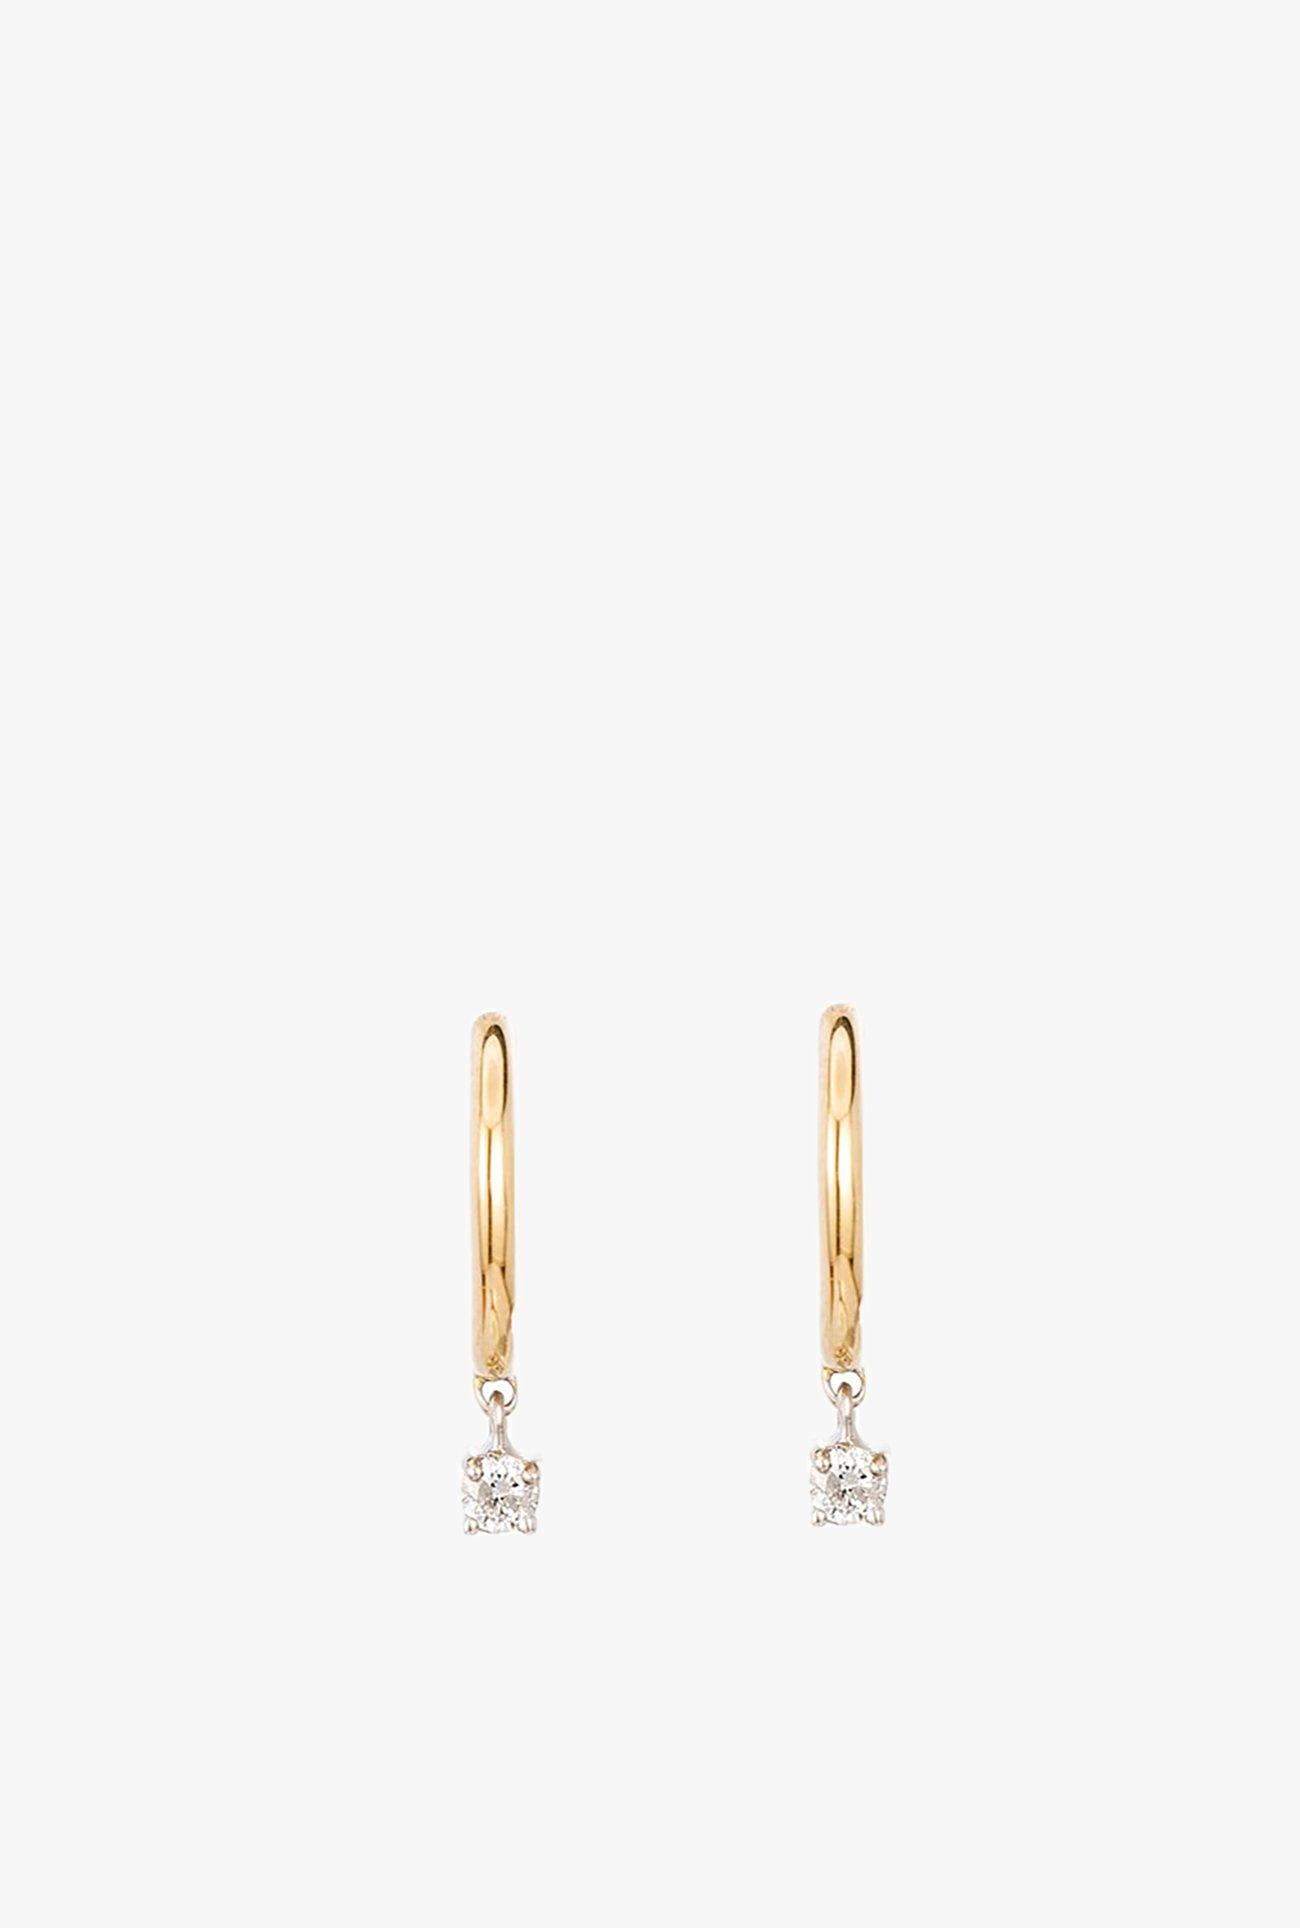 80681818c Adina Reyter 1 Diamond Charm Huggie Hoop Earrings - 14k Gold ...